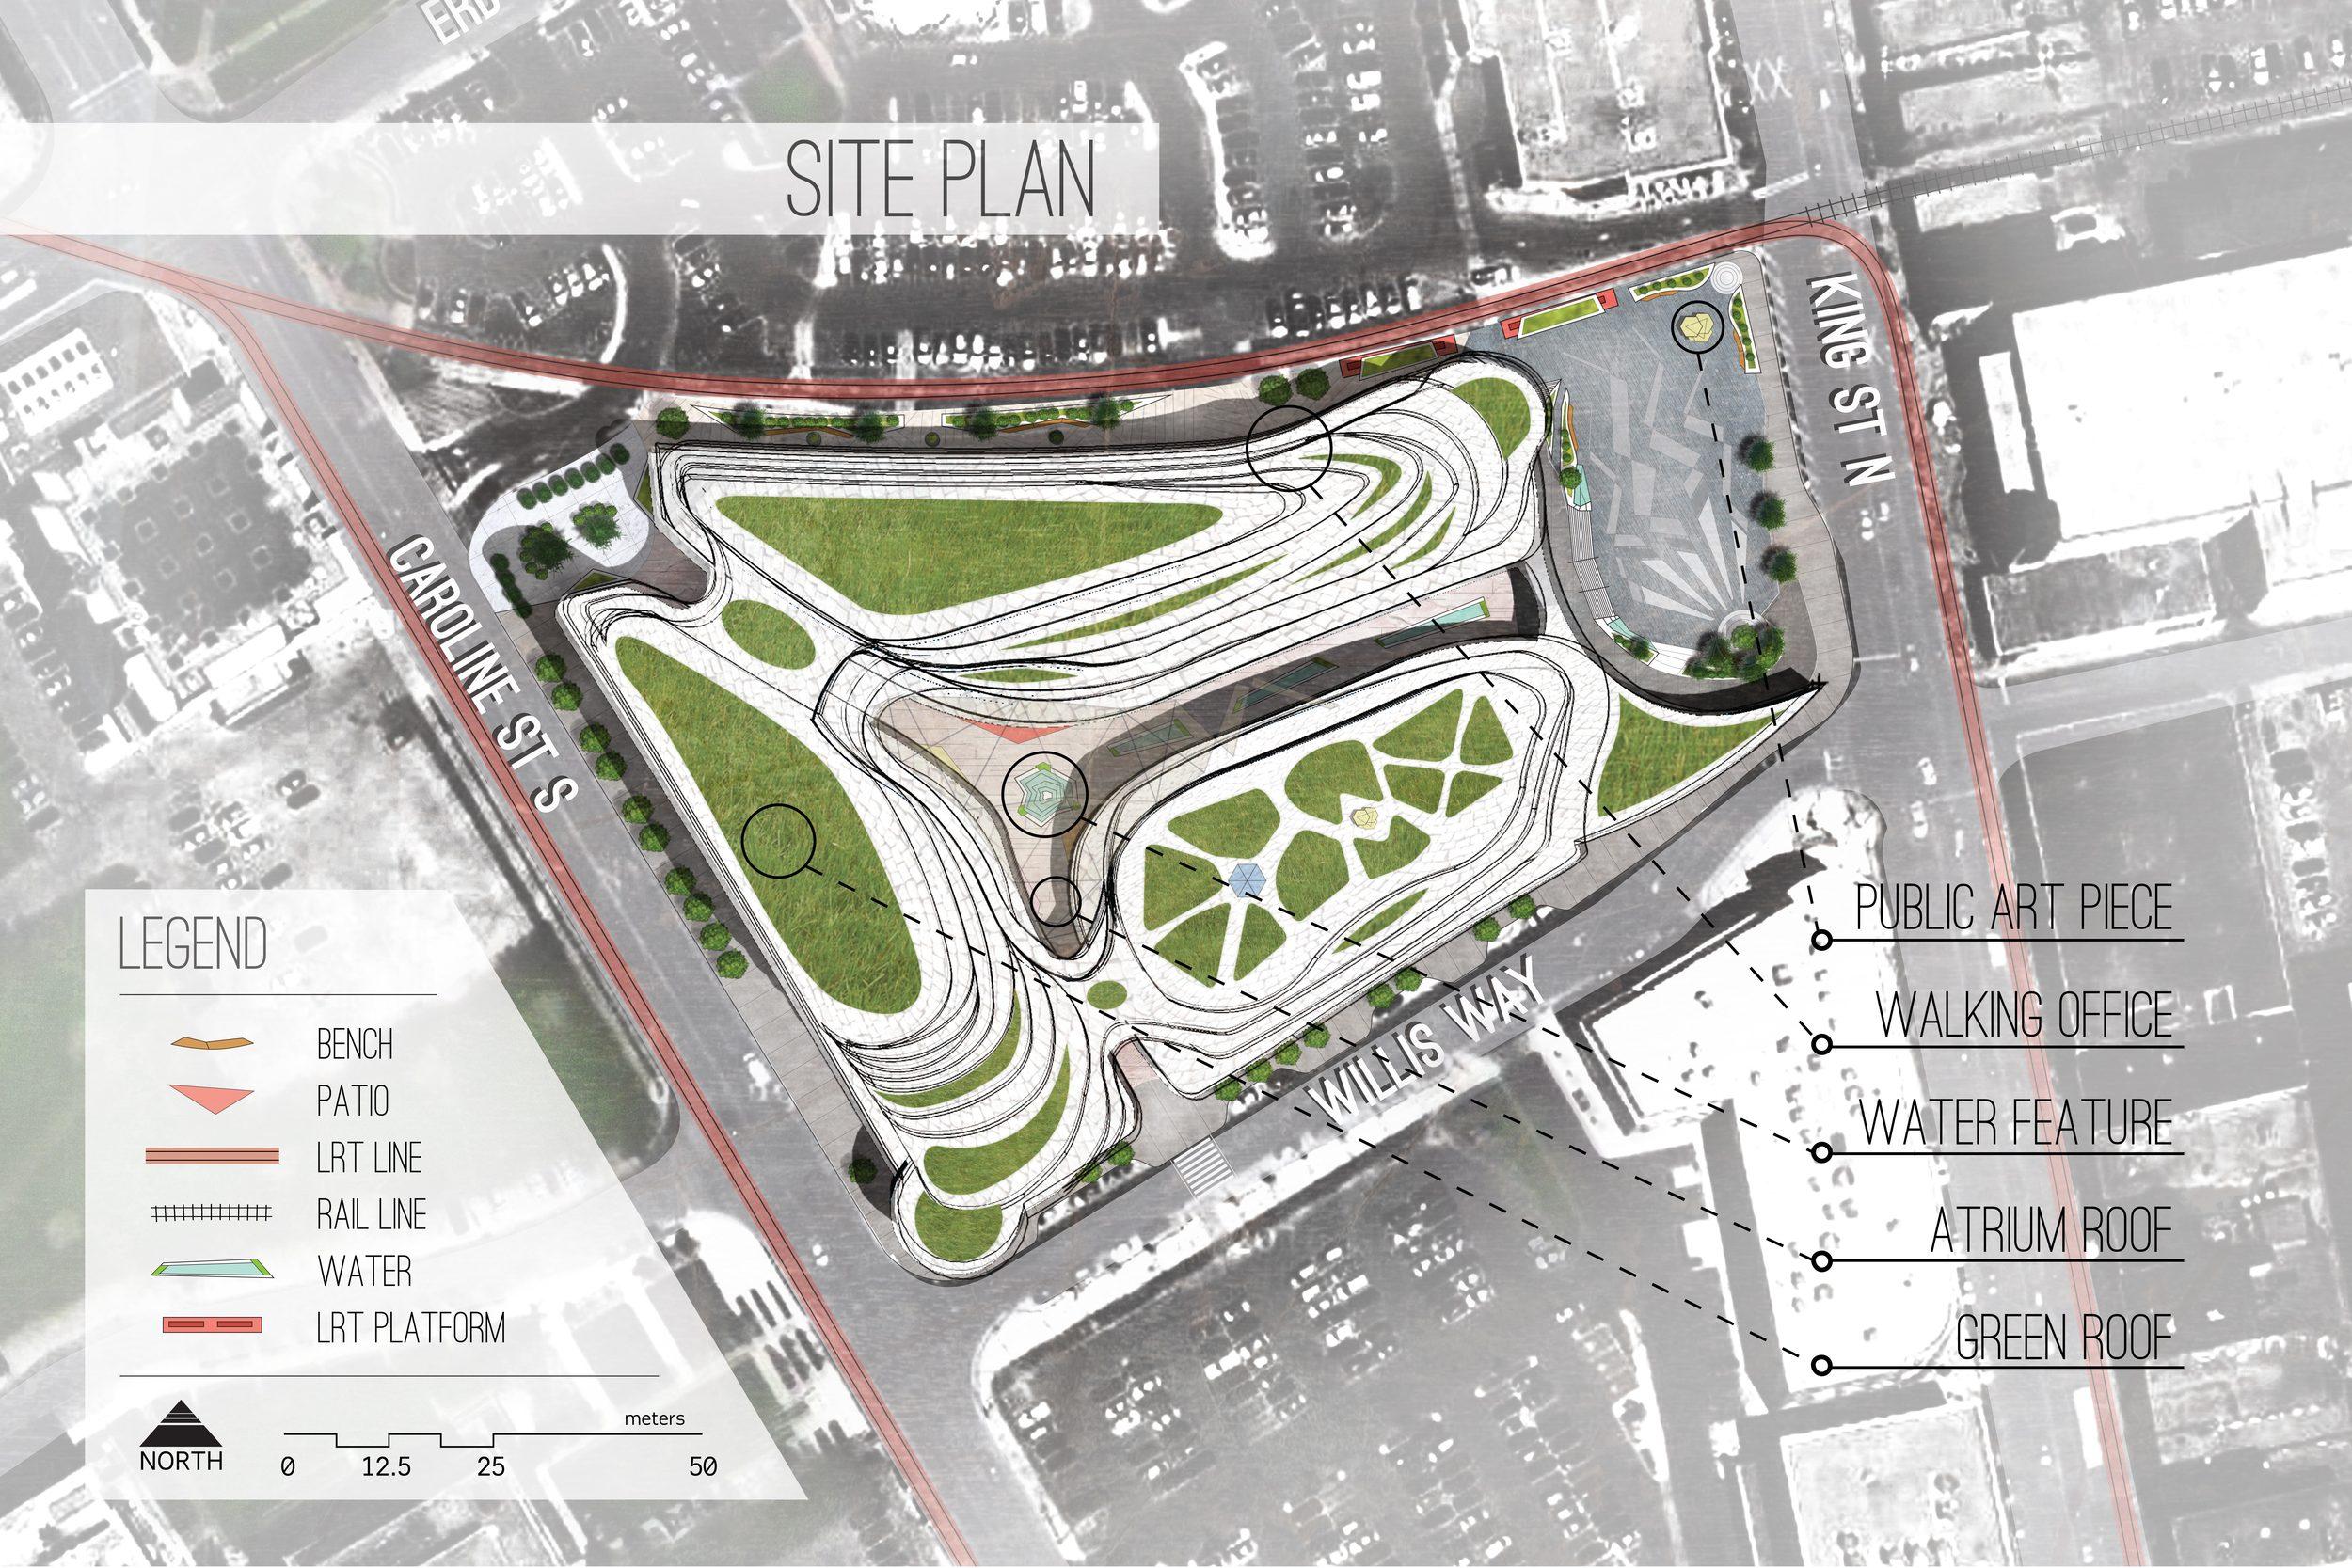 Site Plan_Final Layout-01-01.jpg